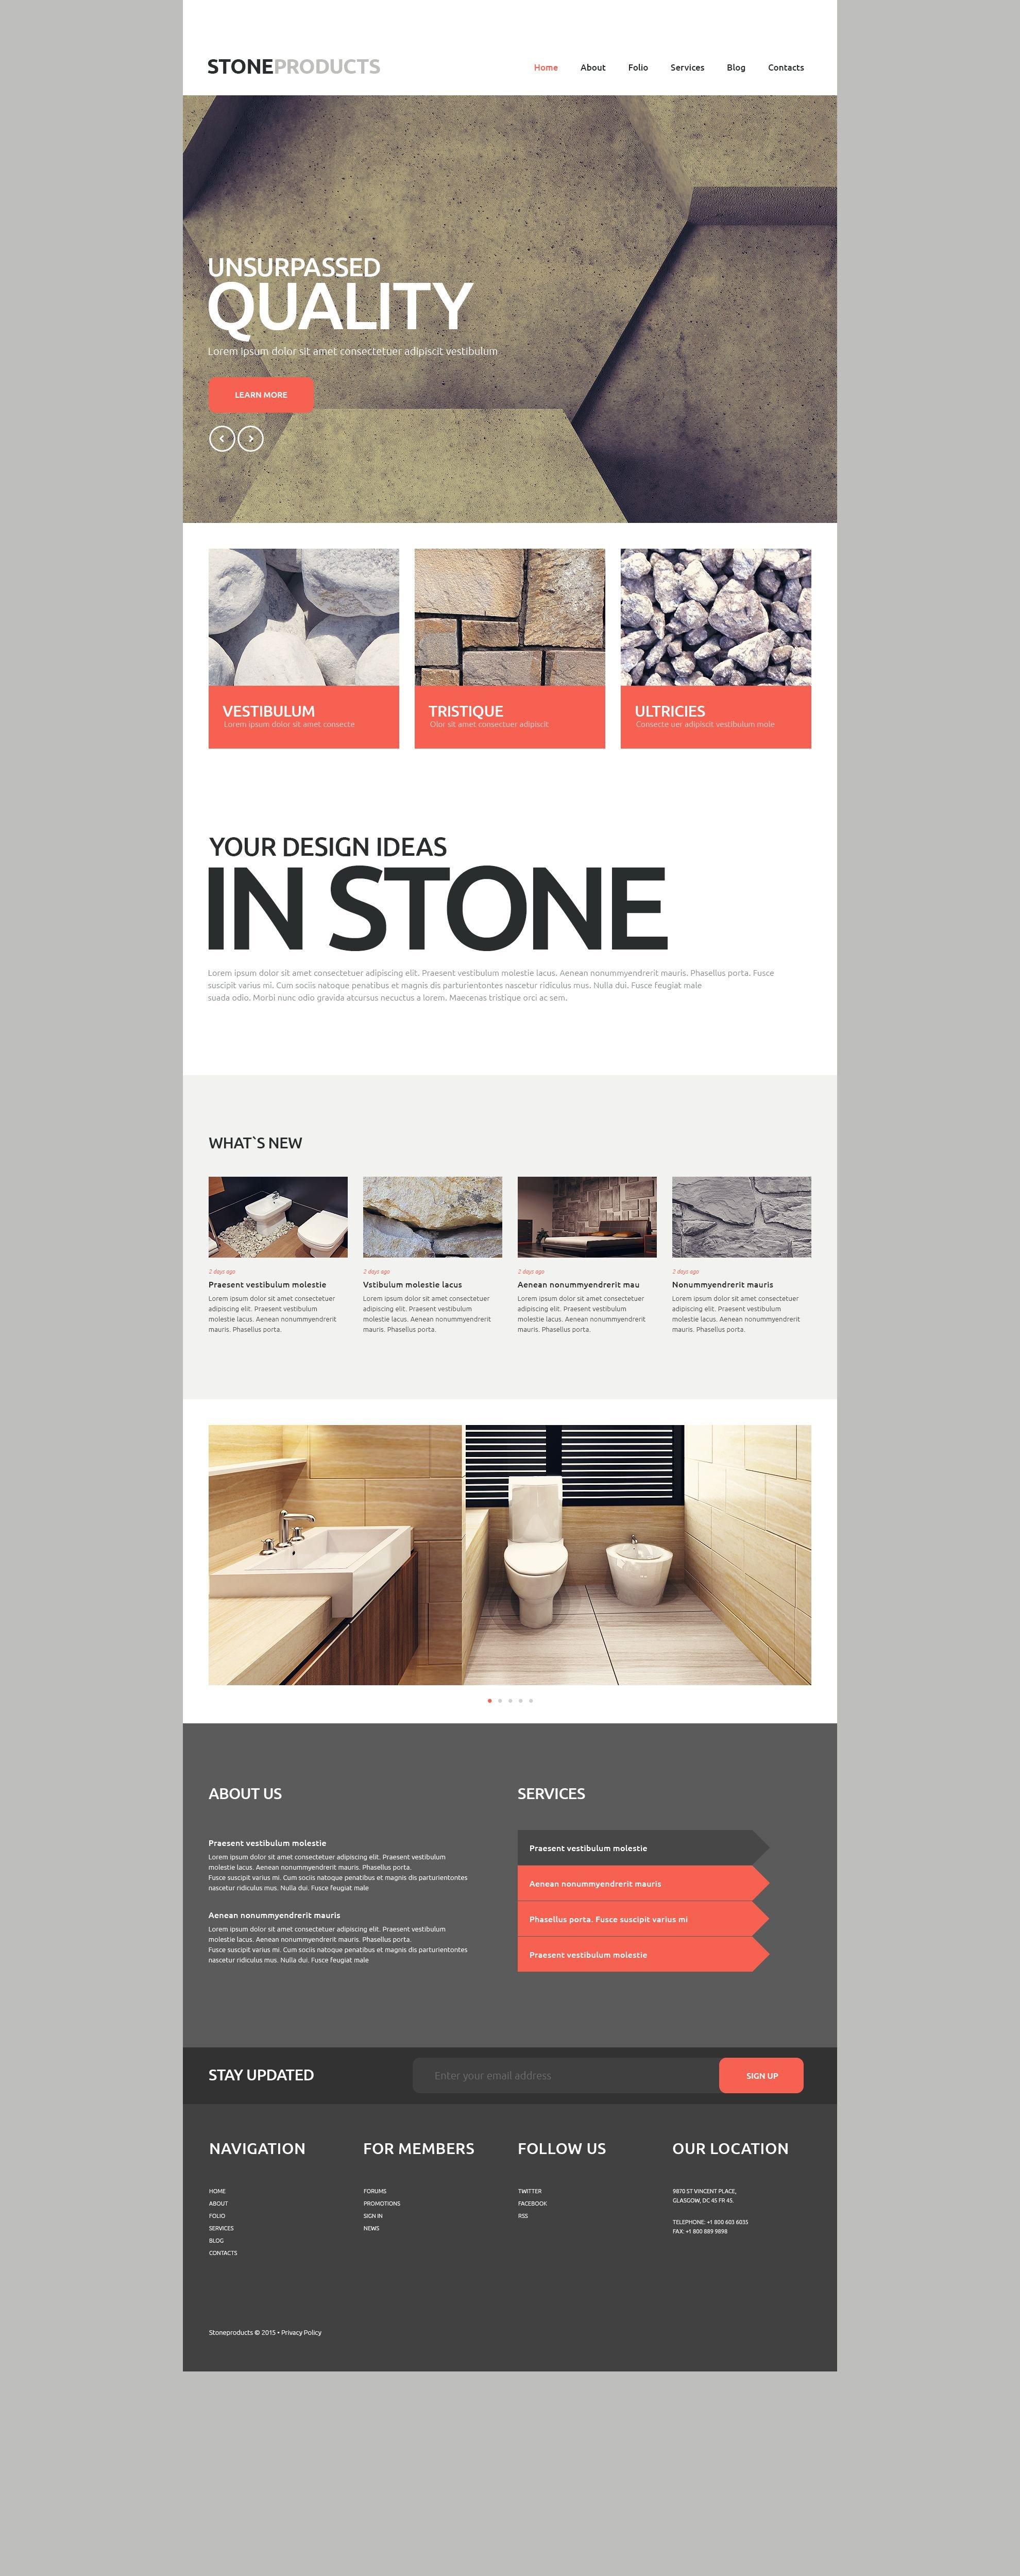 Flooring Products Website Template - screenshot